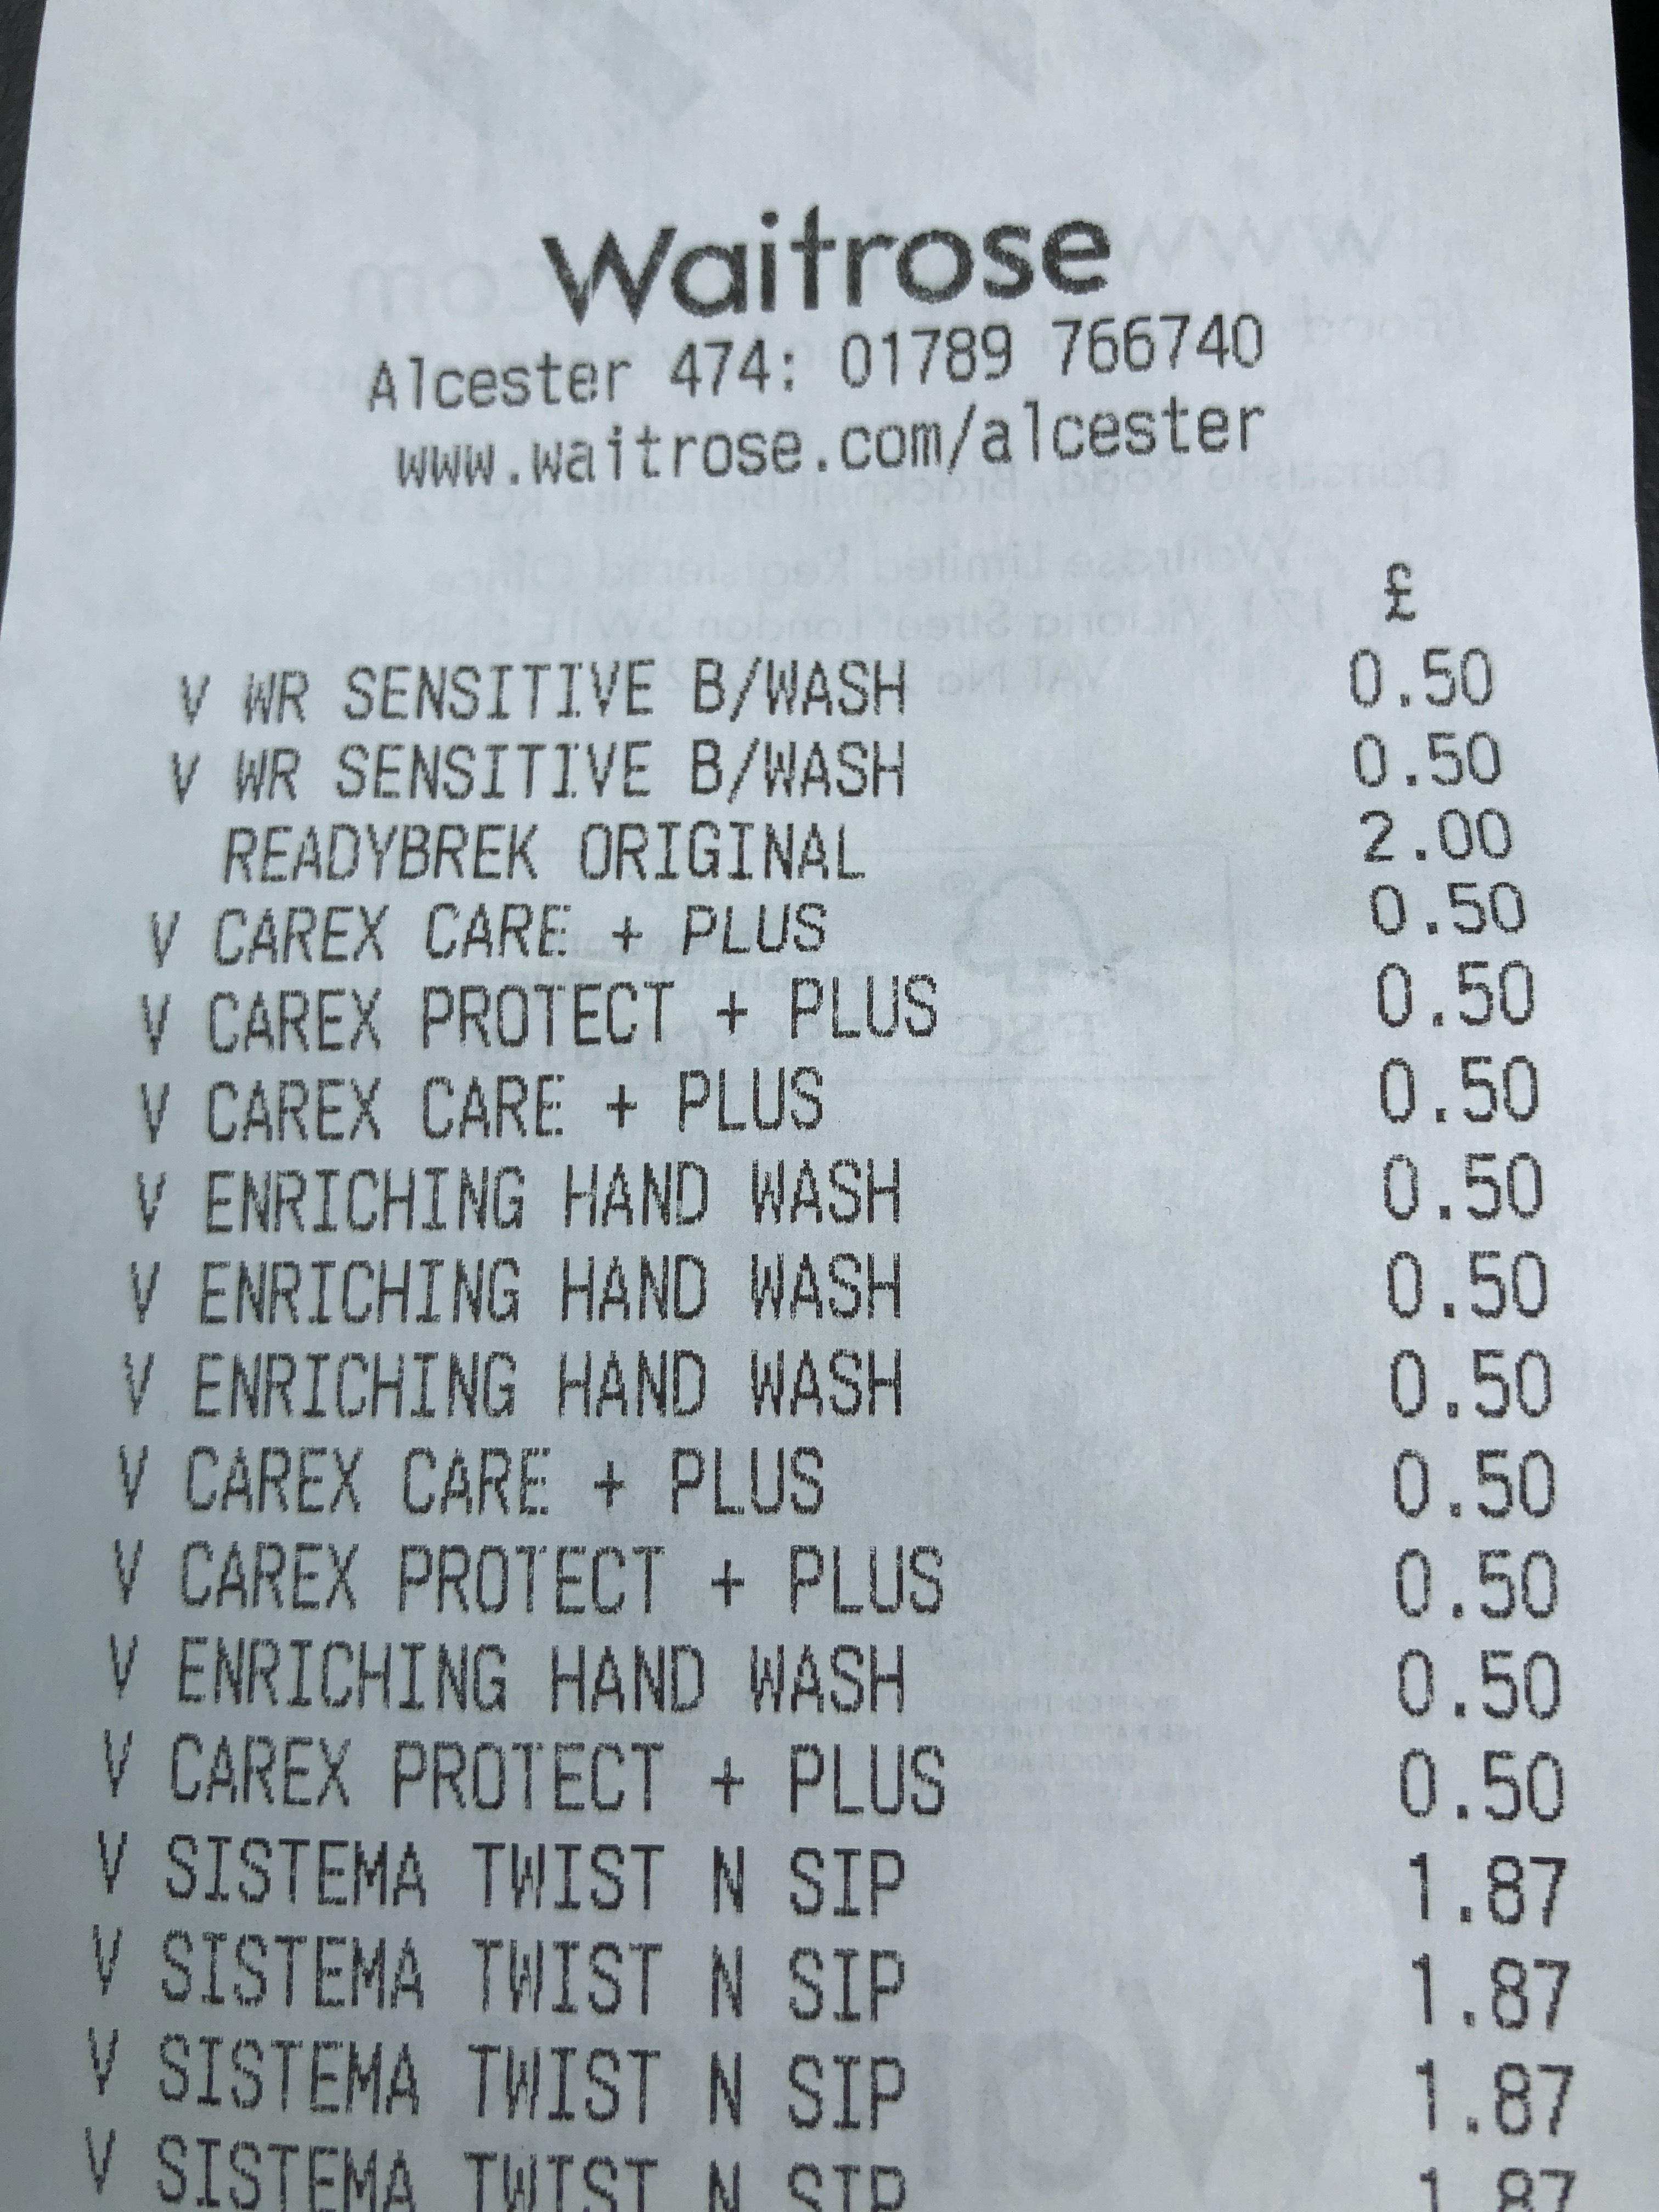 Carex hand wash 50p Waitrose - Alcester